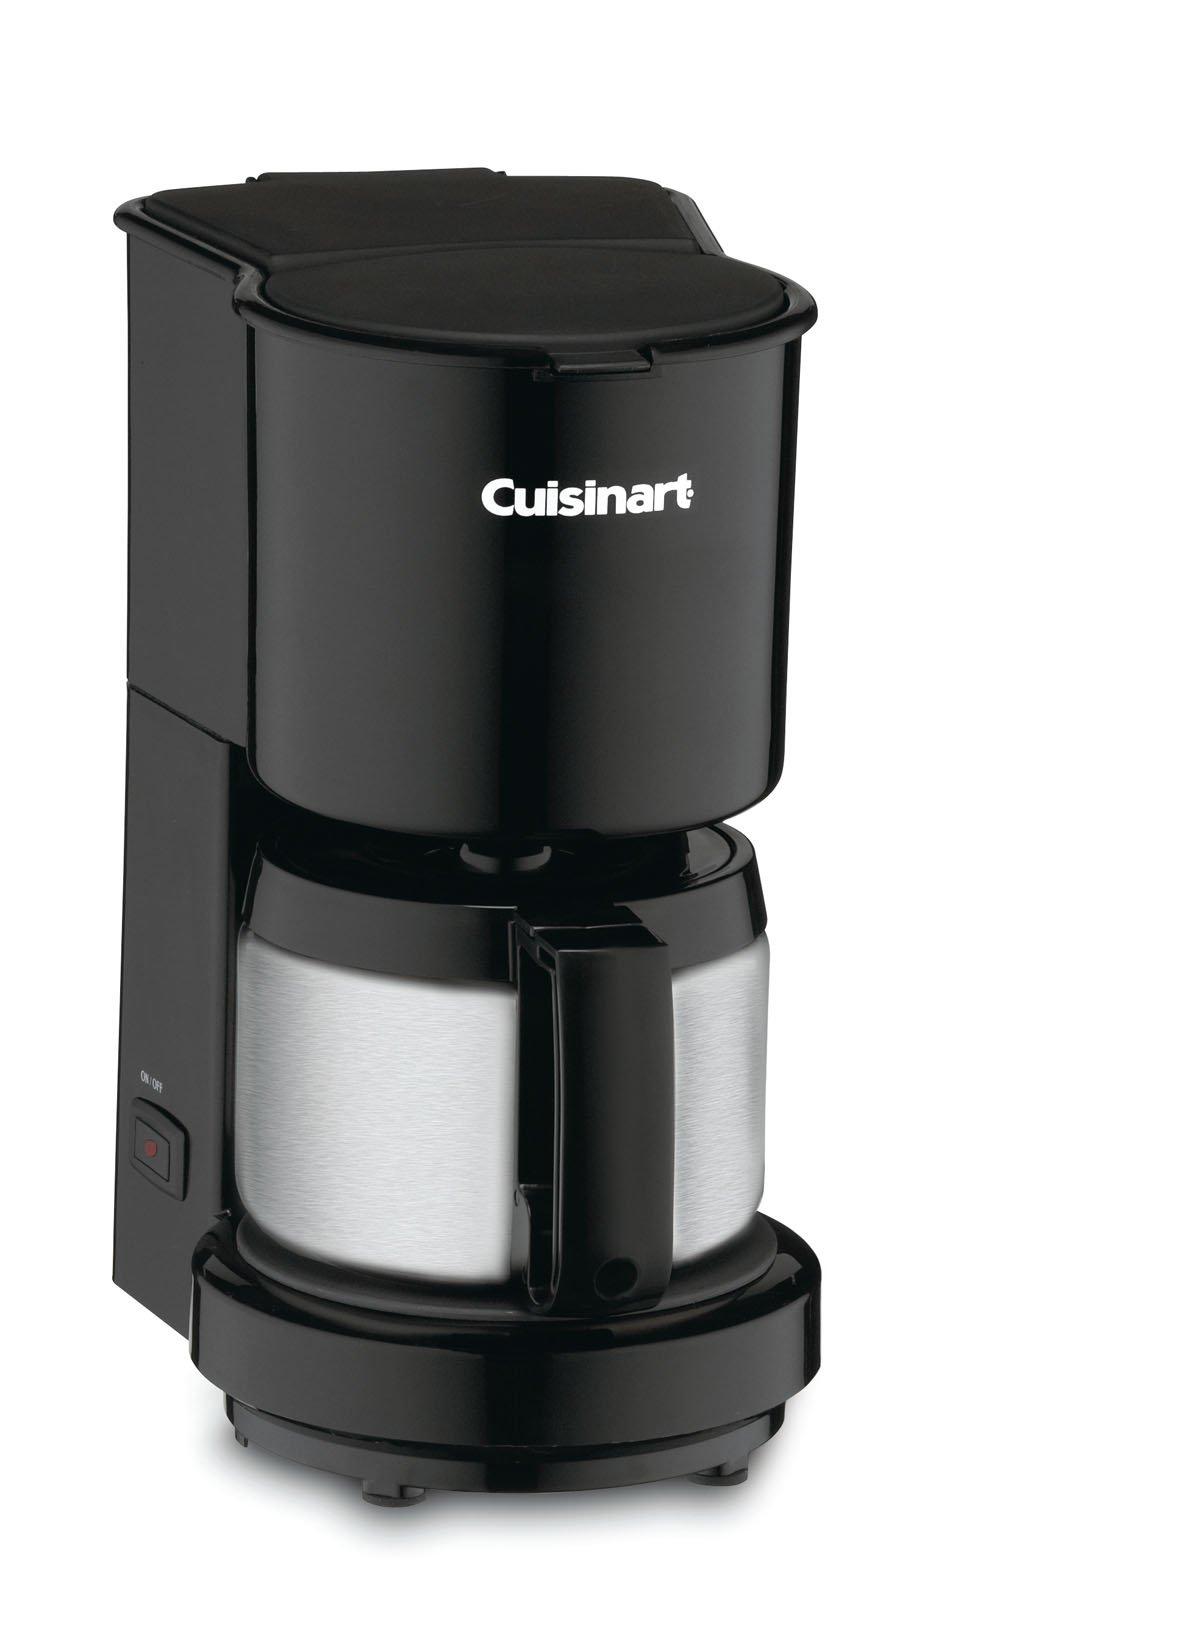 Cuisinart DCC 450BK Coffeemaker Stainless Steel Carafe